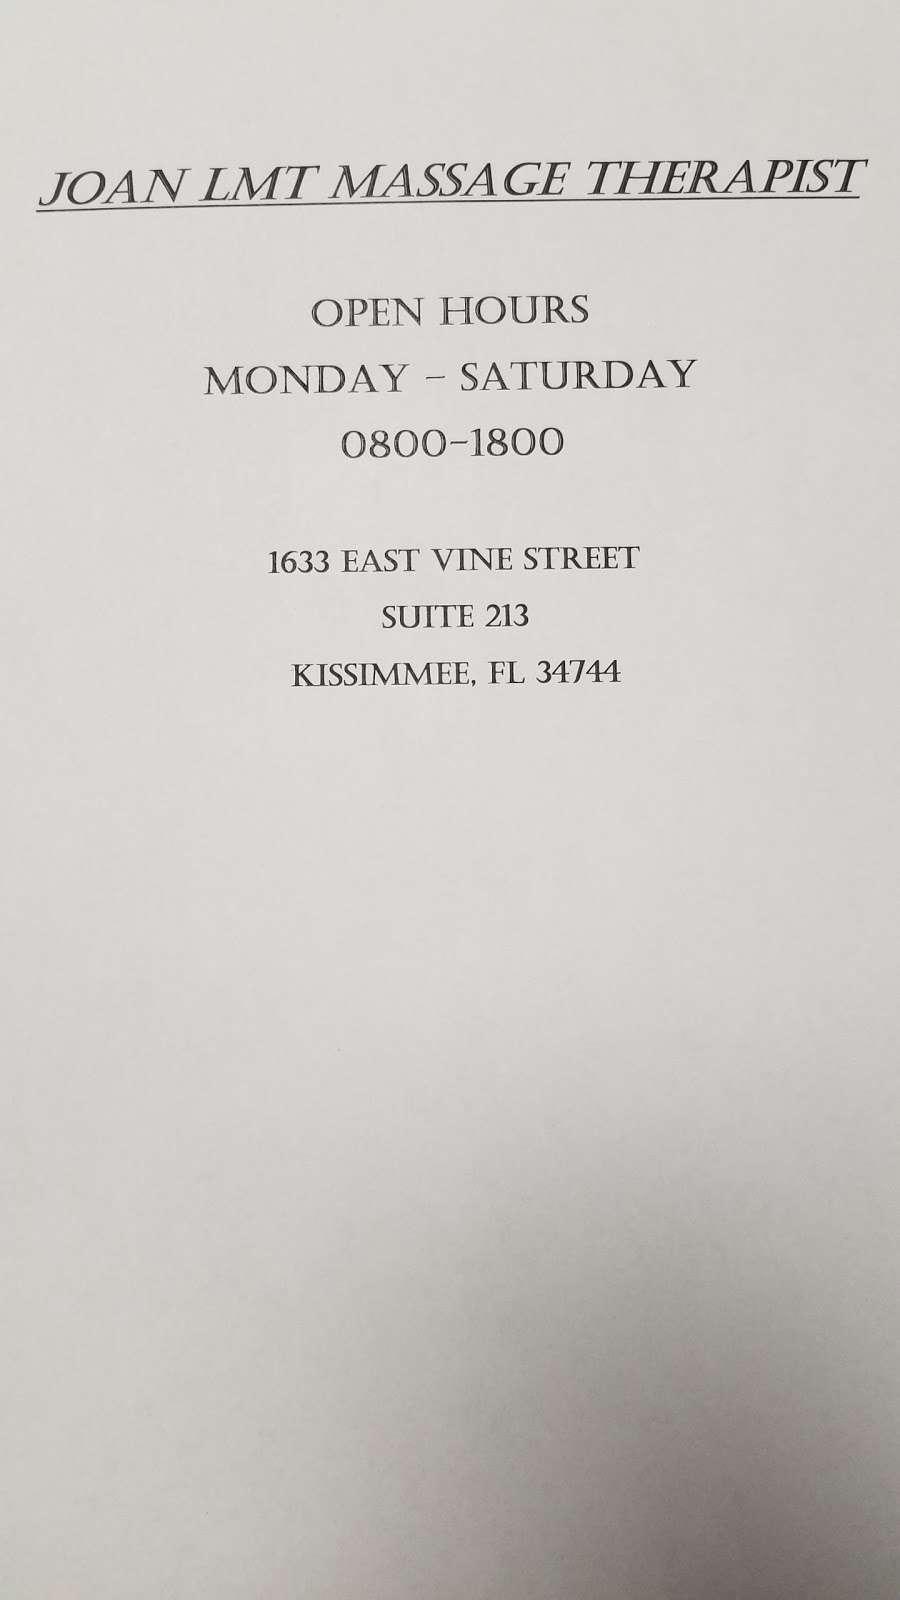 Joan LMT - spa  | Photo 8 of 8 | Address: 1633 E Vine St, Kissimmee, FL 34744, USA | Phone: (407) 489-1687